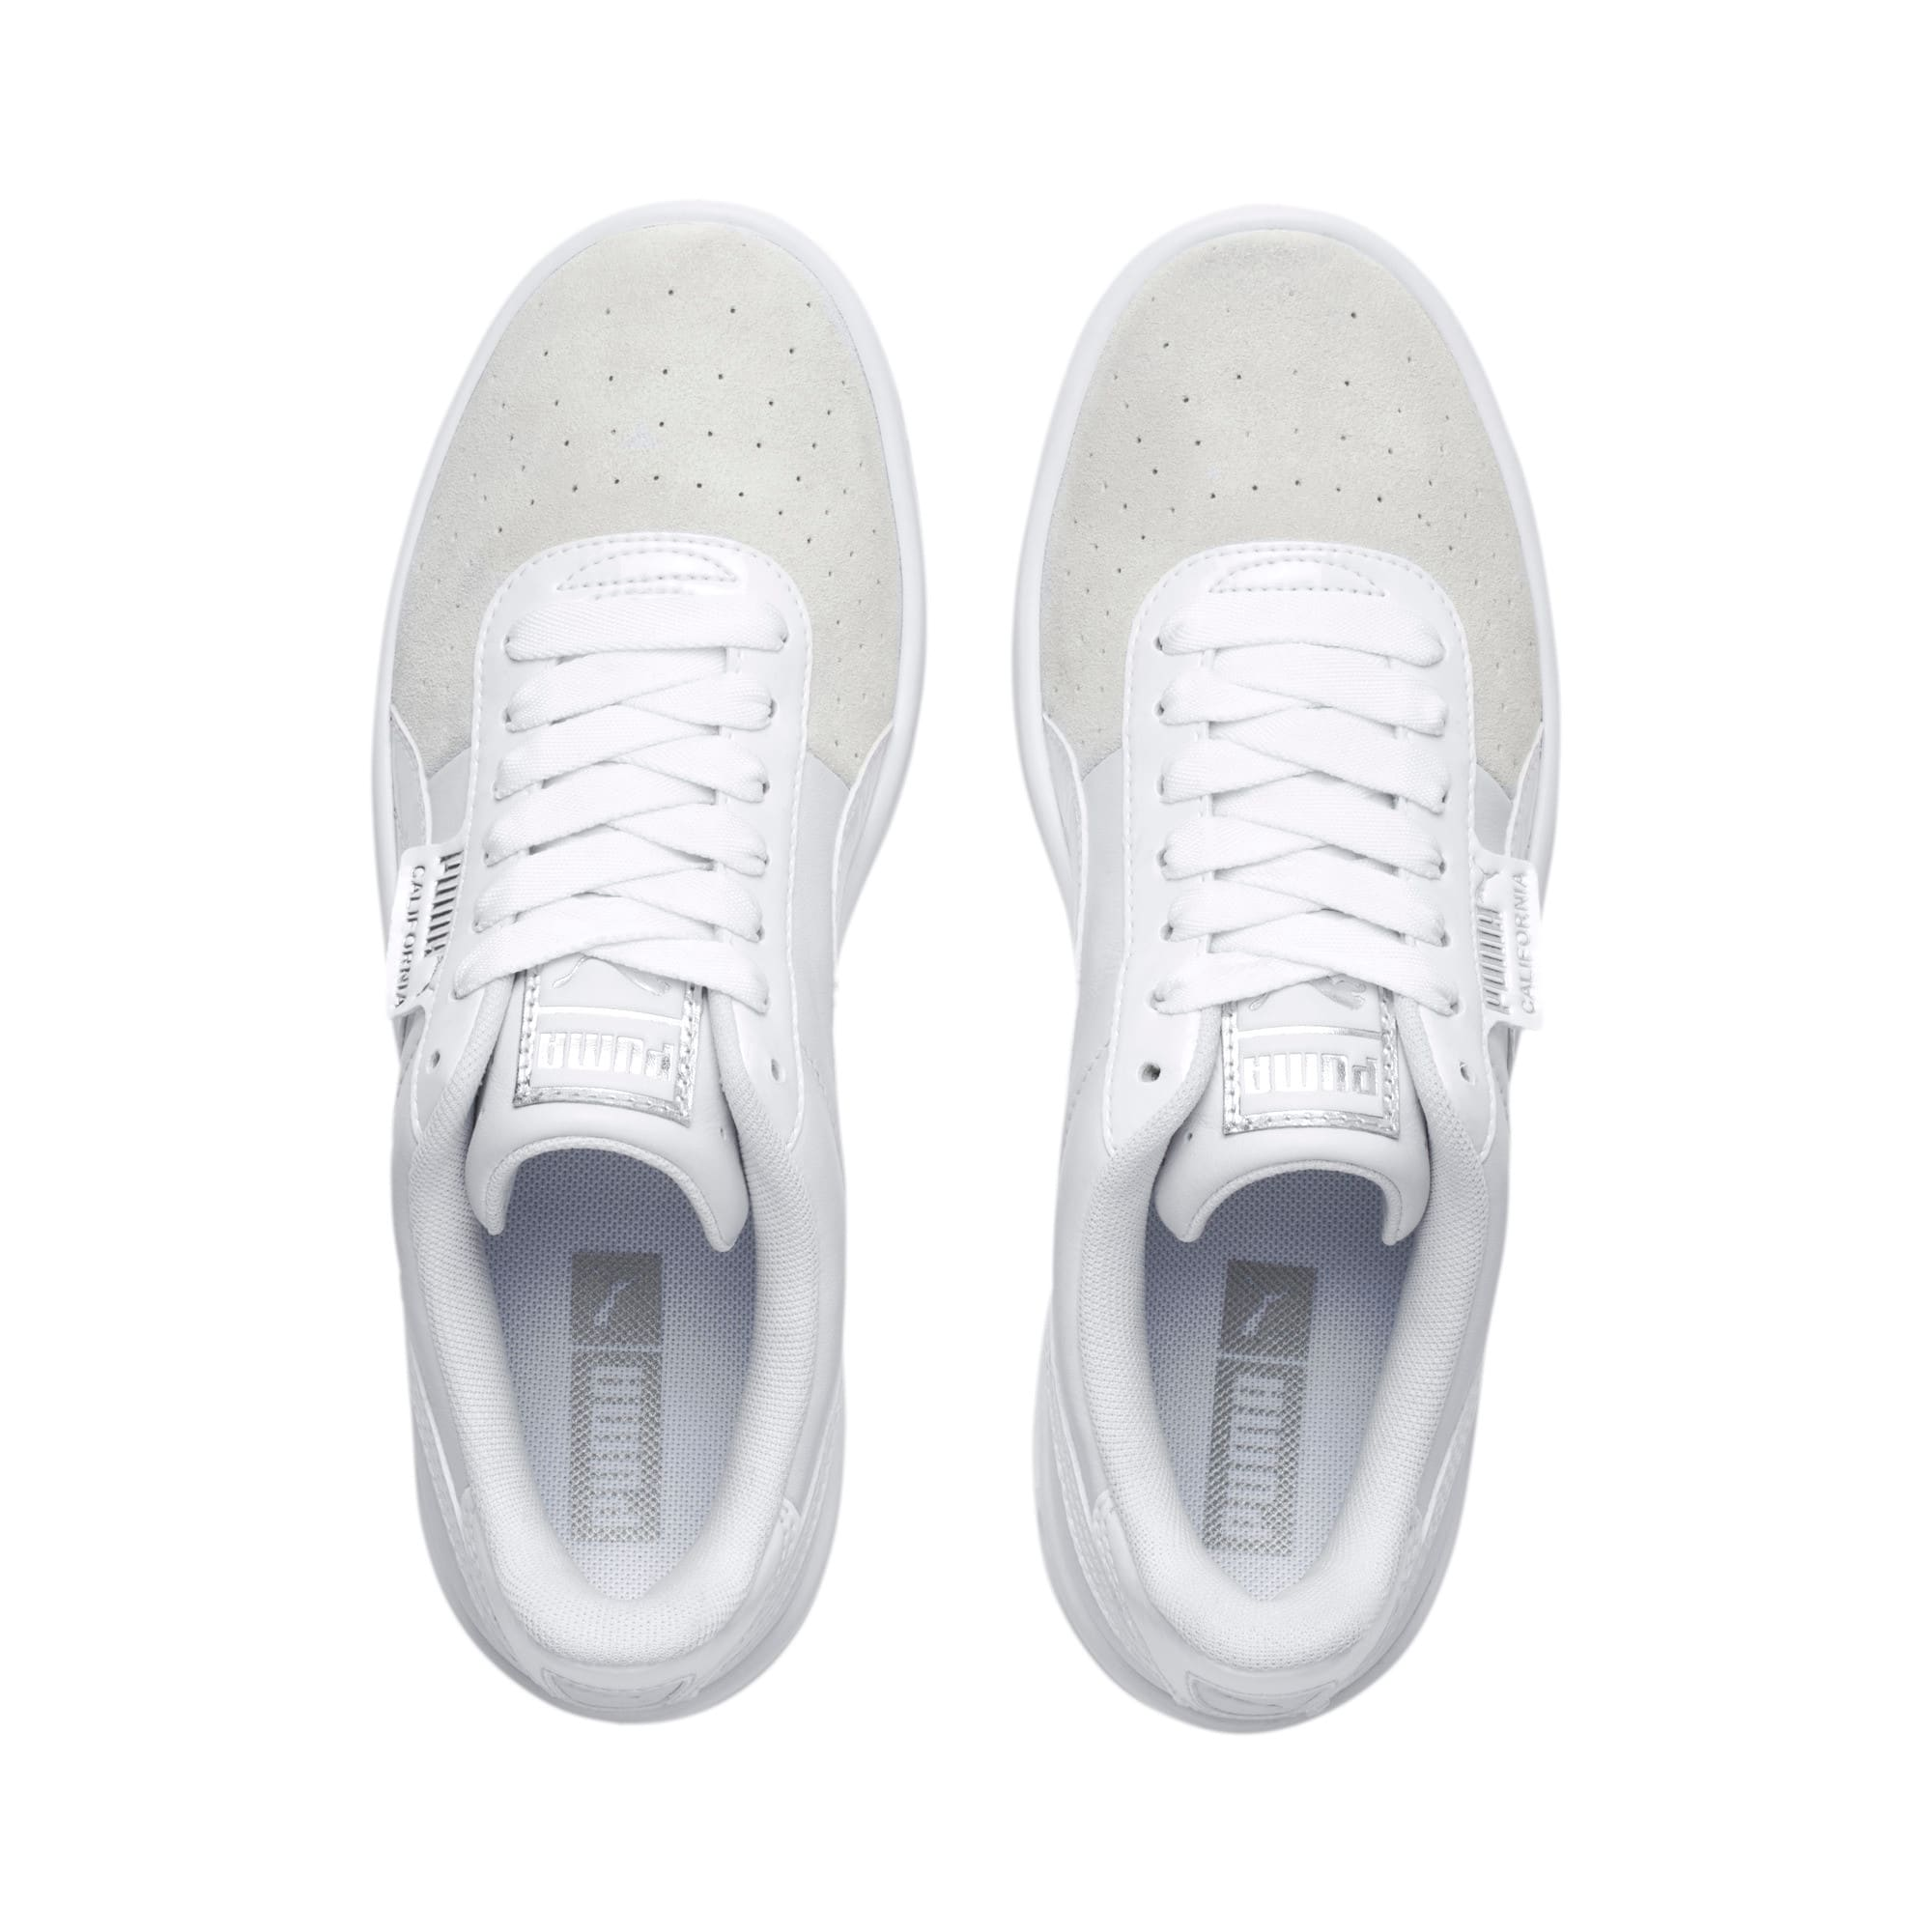 Thumbnail 7 of California Monochrome Women's Sneakers, Puma White-Puma Silver, medium